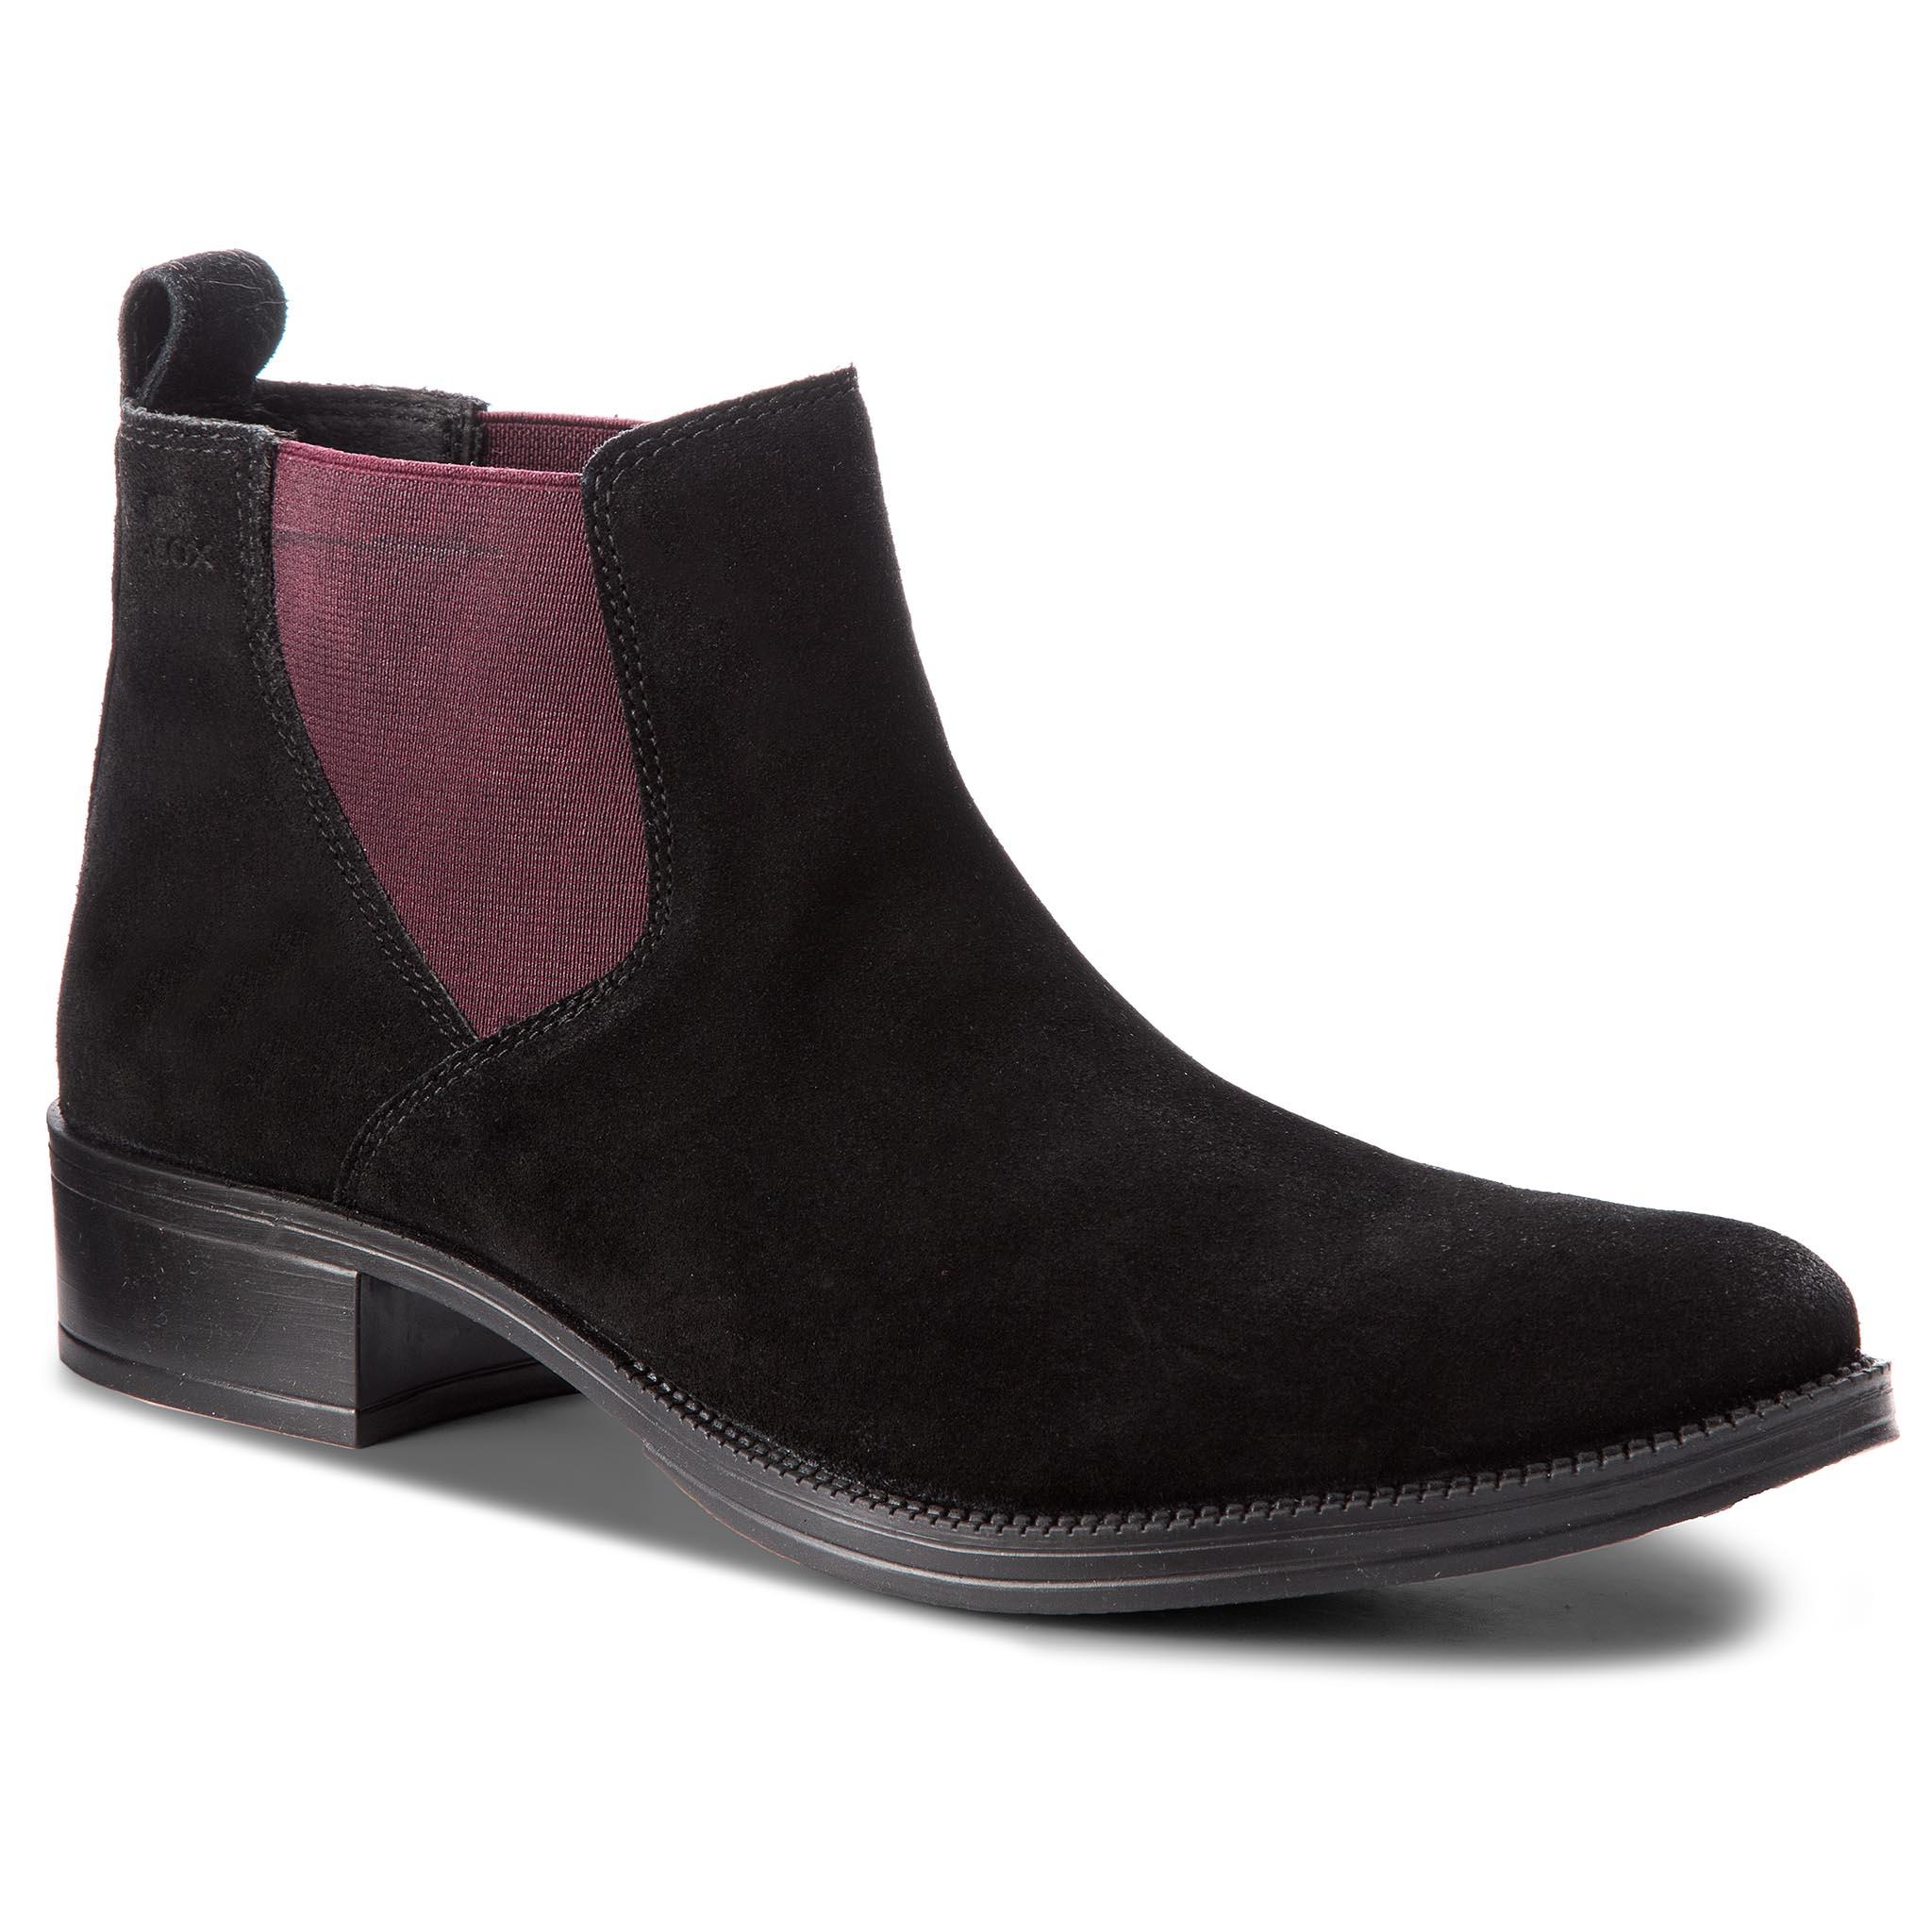 a7391901c37 Kotníková obuv s elastickým prvkom GEOX - D Laceyin C D84BFC 00023 ...